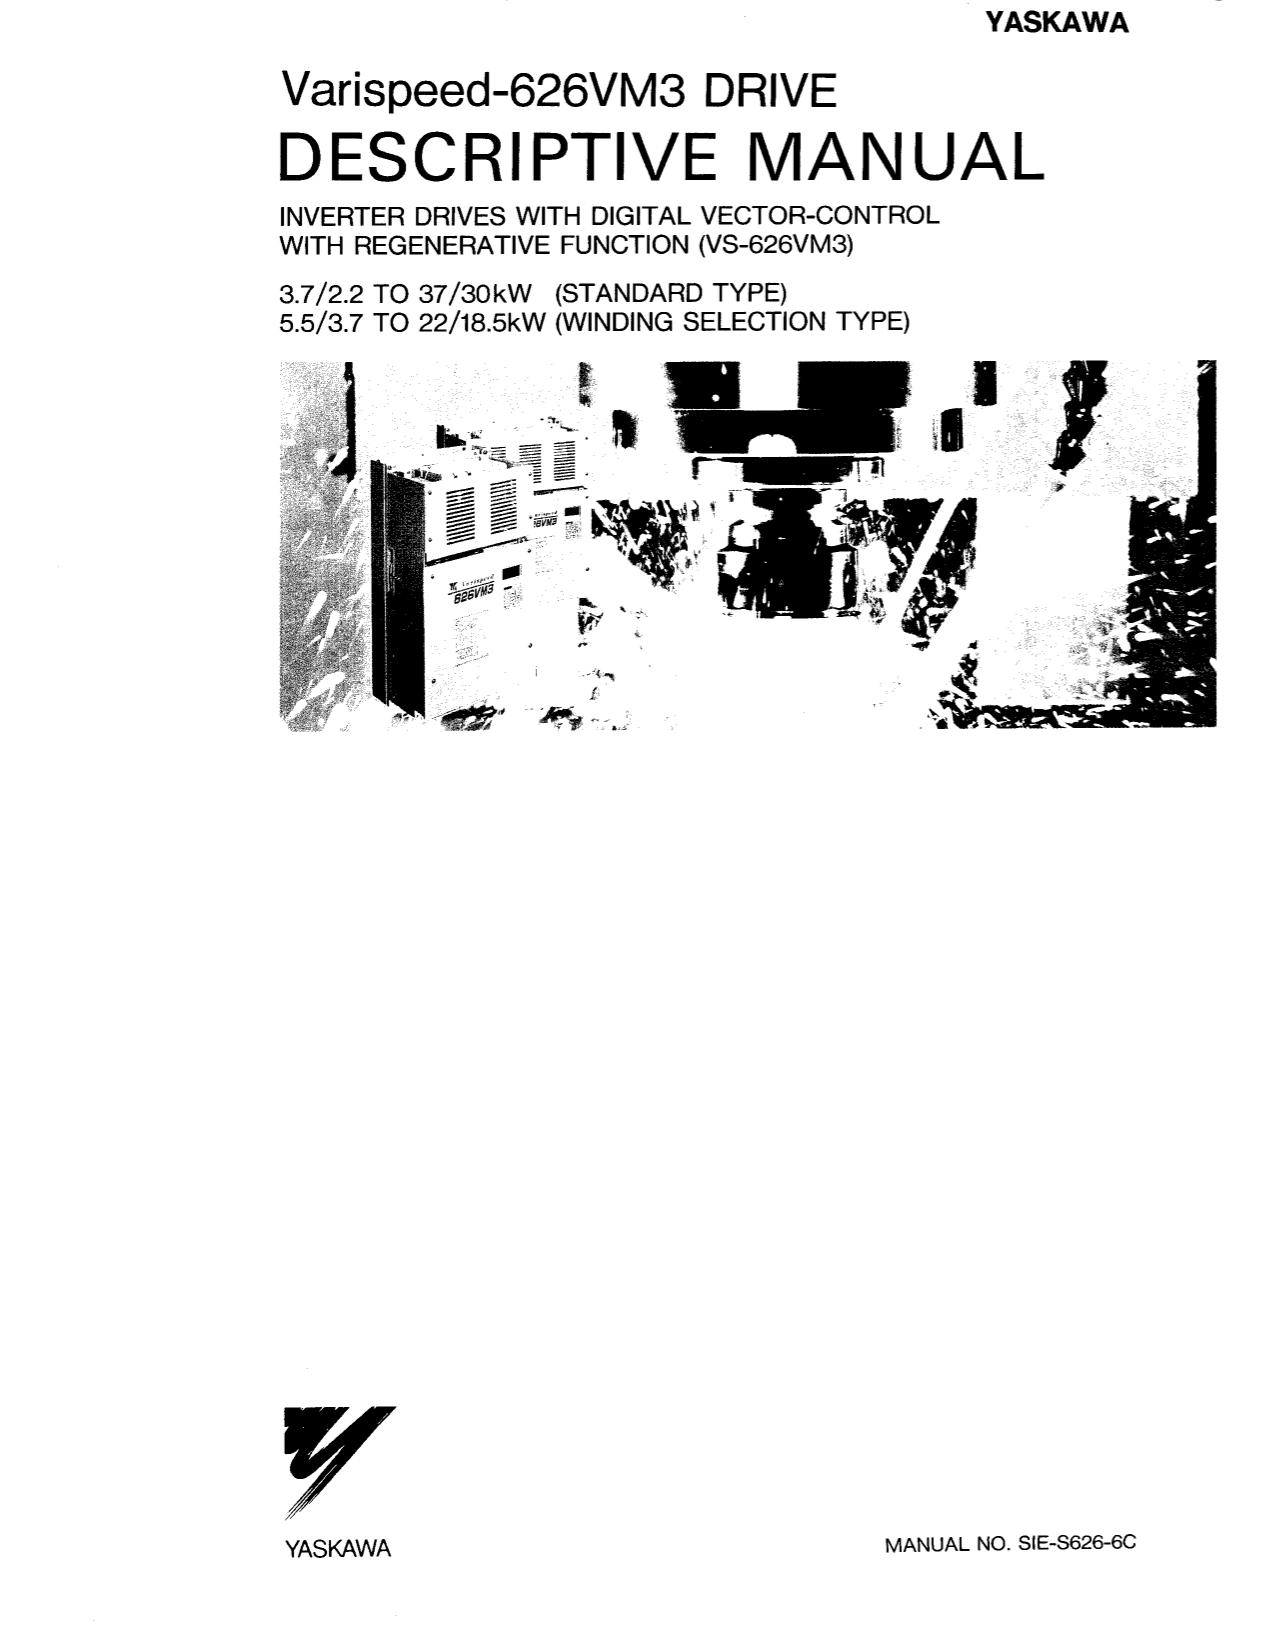 pdf for LaCie Storage 301371 manual